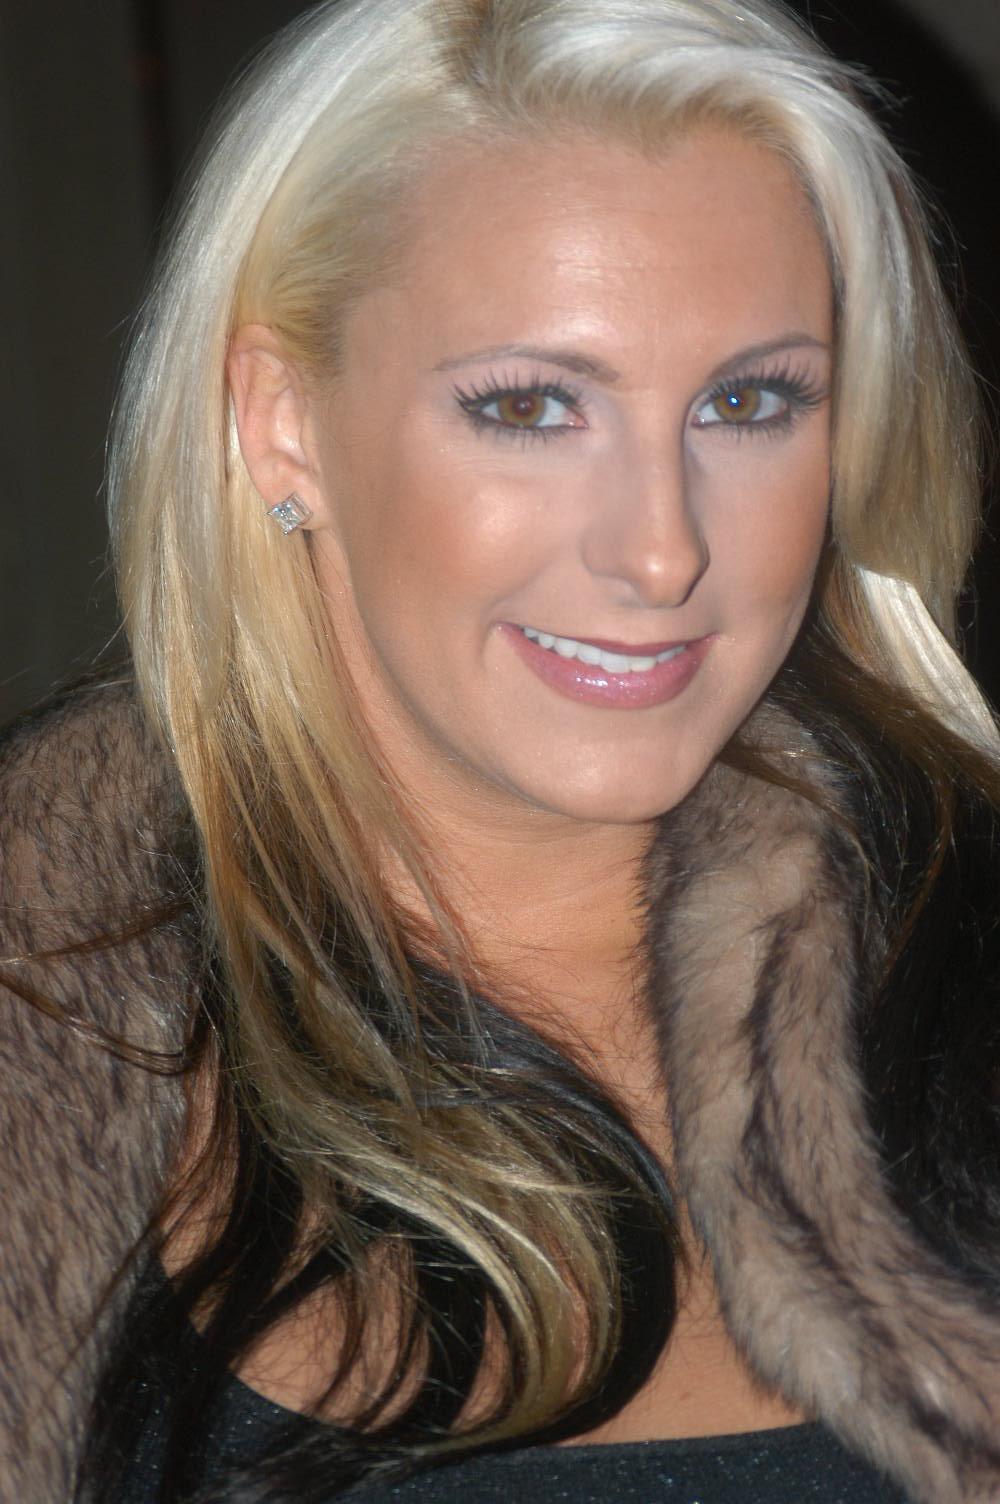 File:Emilianna at Porn Star Karaoke 5.jpg - Wikimedia Commons